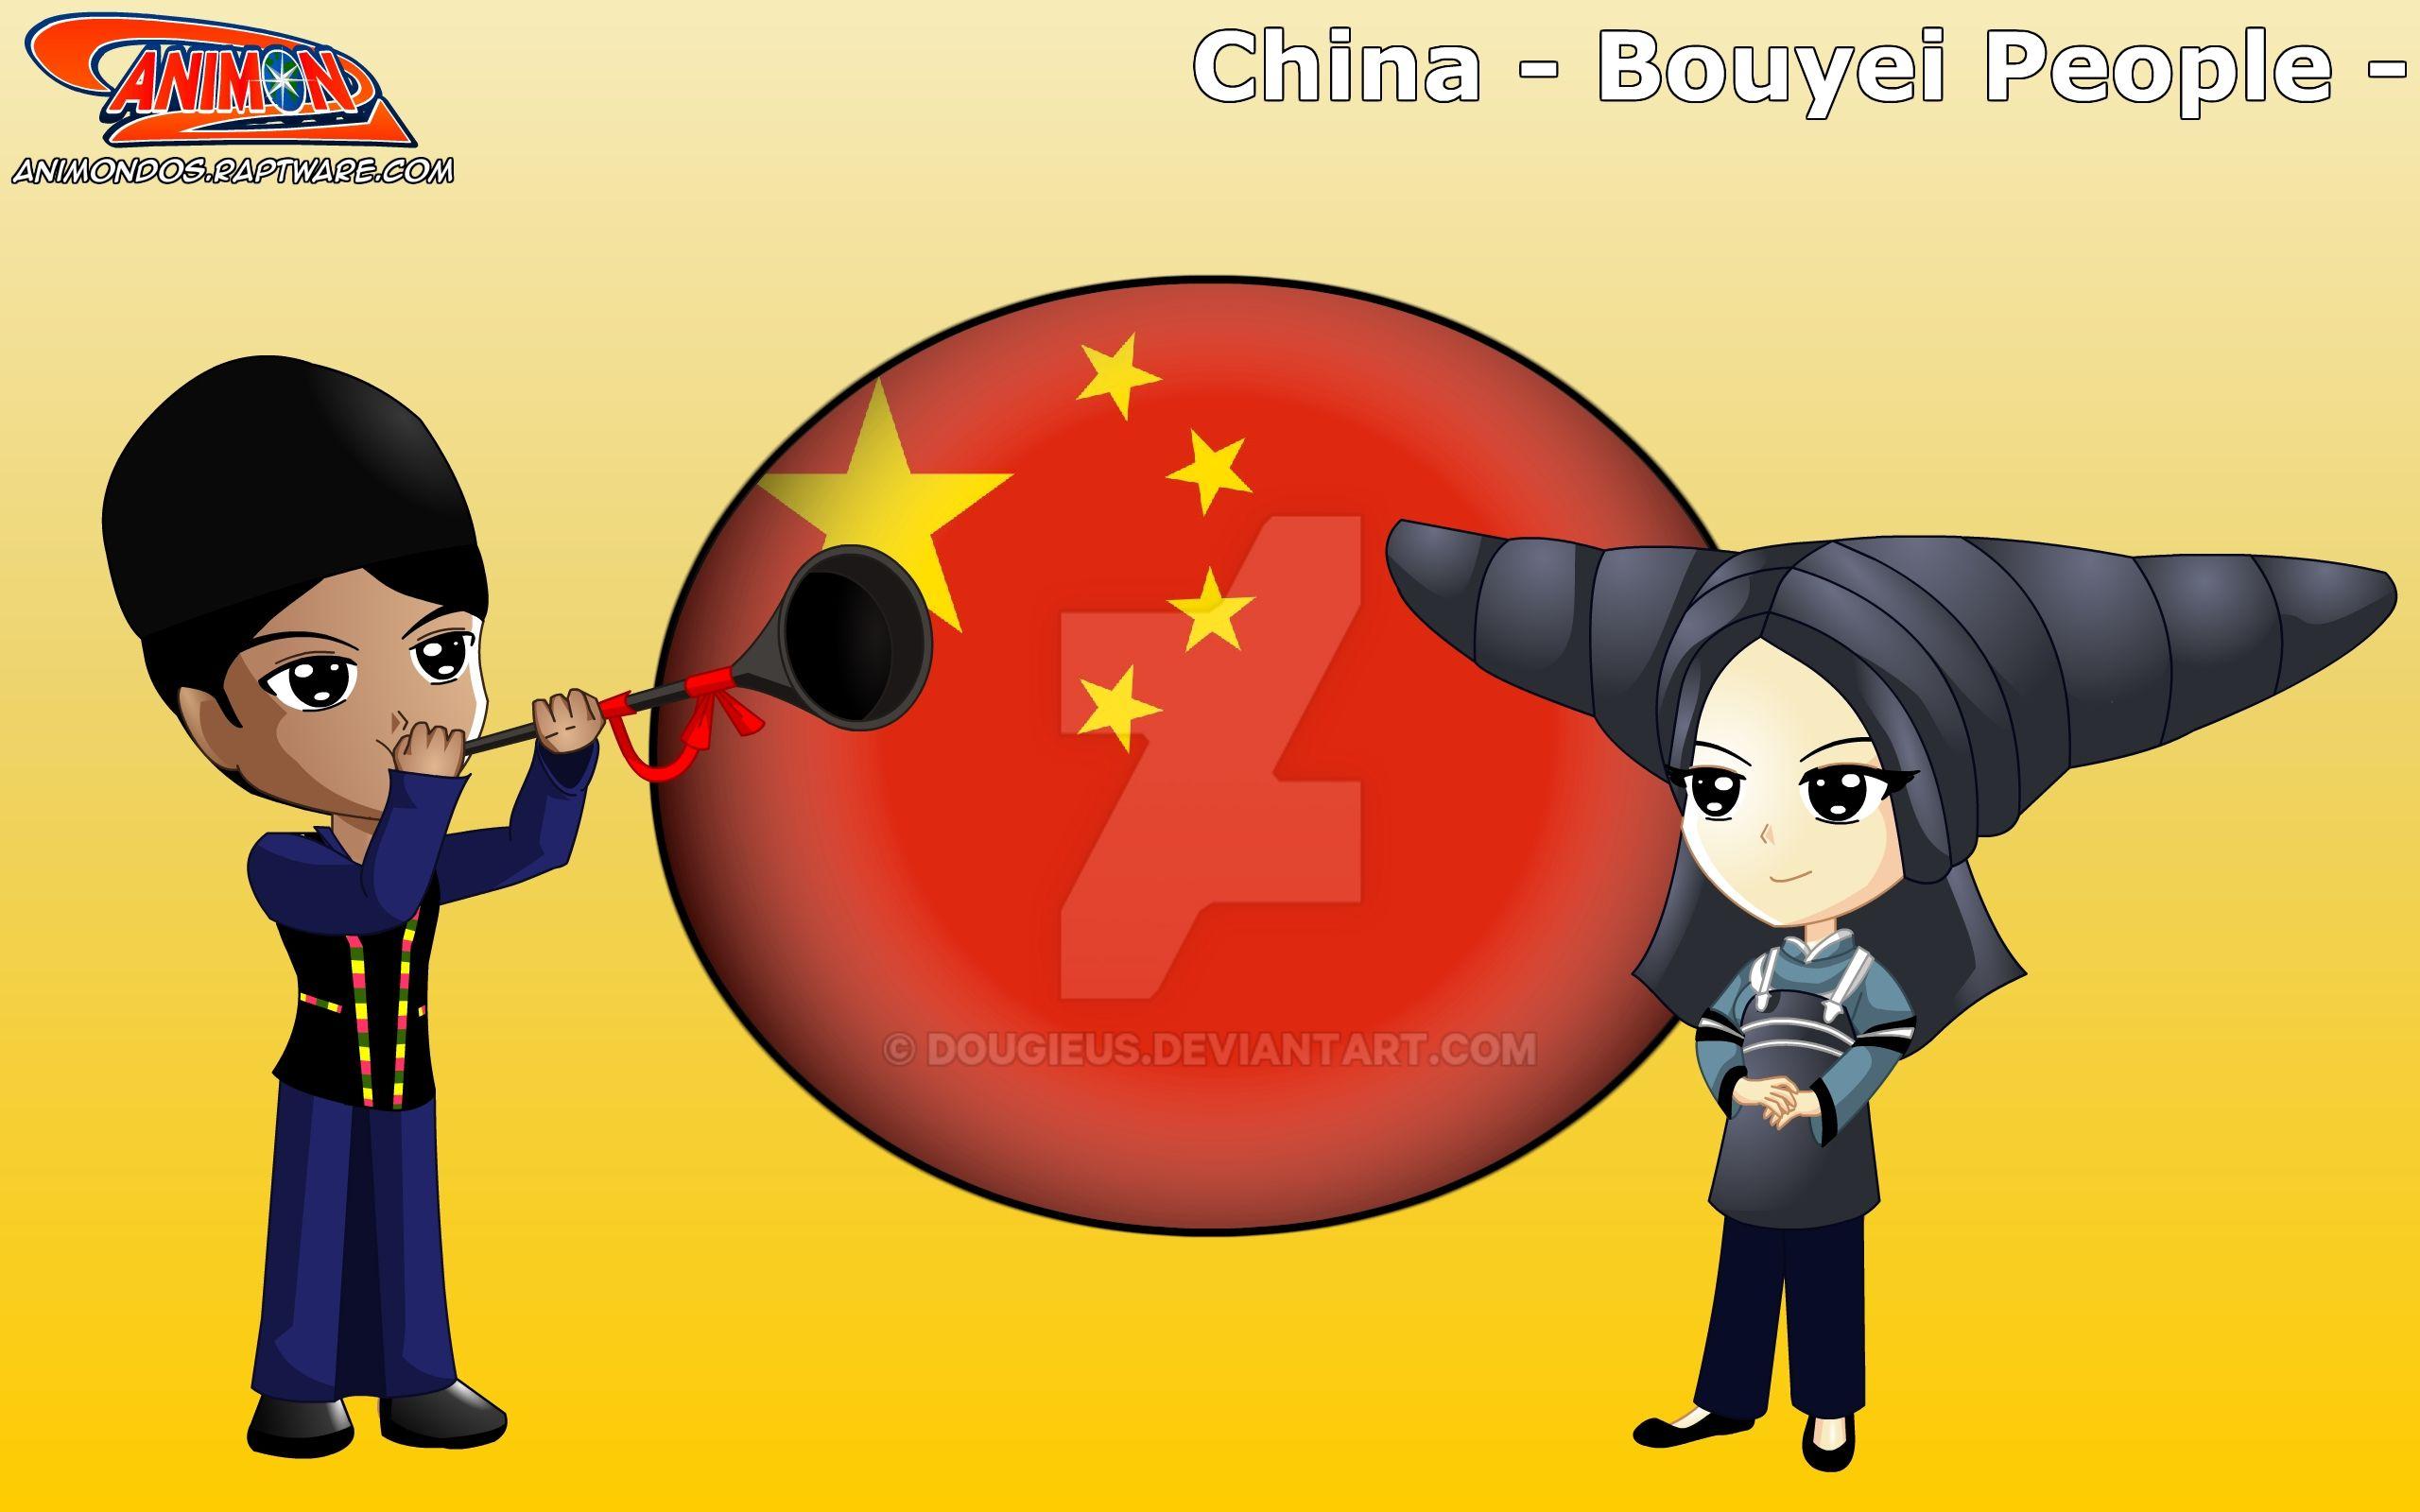 Chibi china